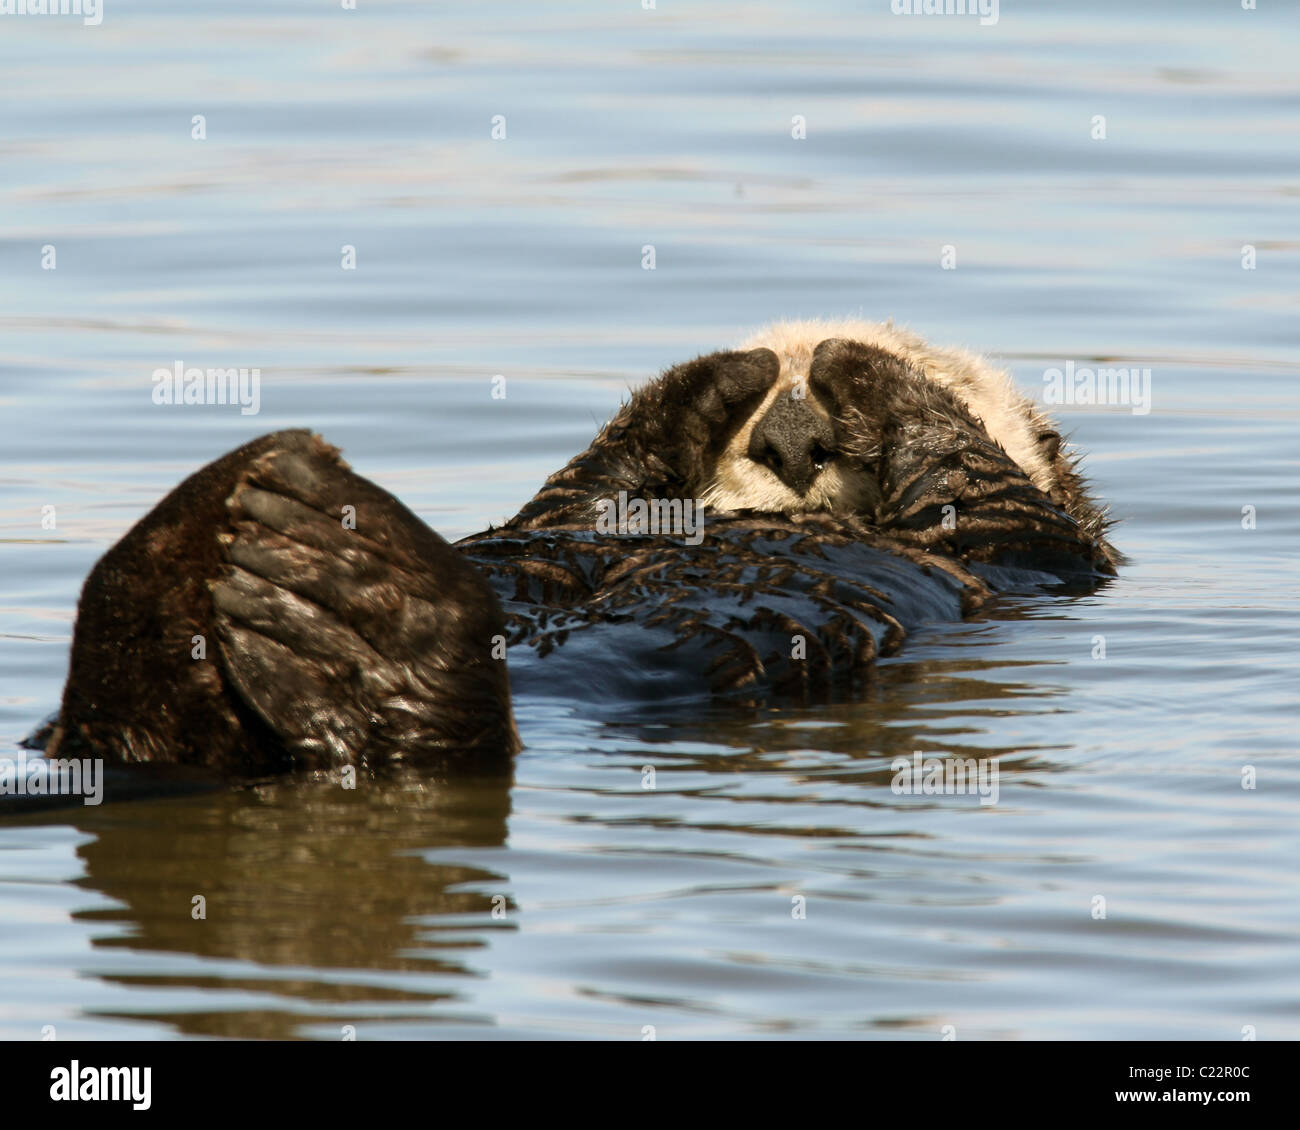 sea Otter sleeping Moss Landing Monterey Bay Elkhorn Slough National Estuarine Research Reserve - Stock Image